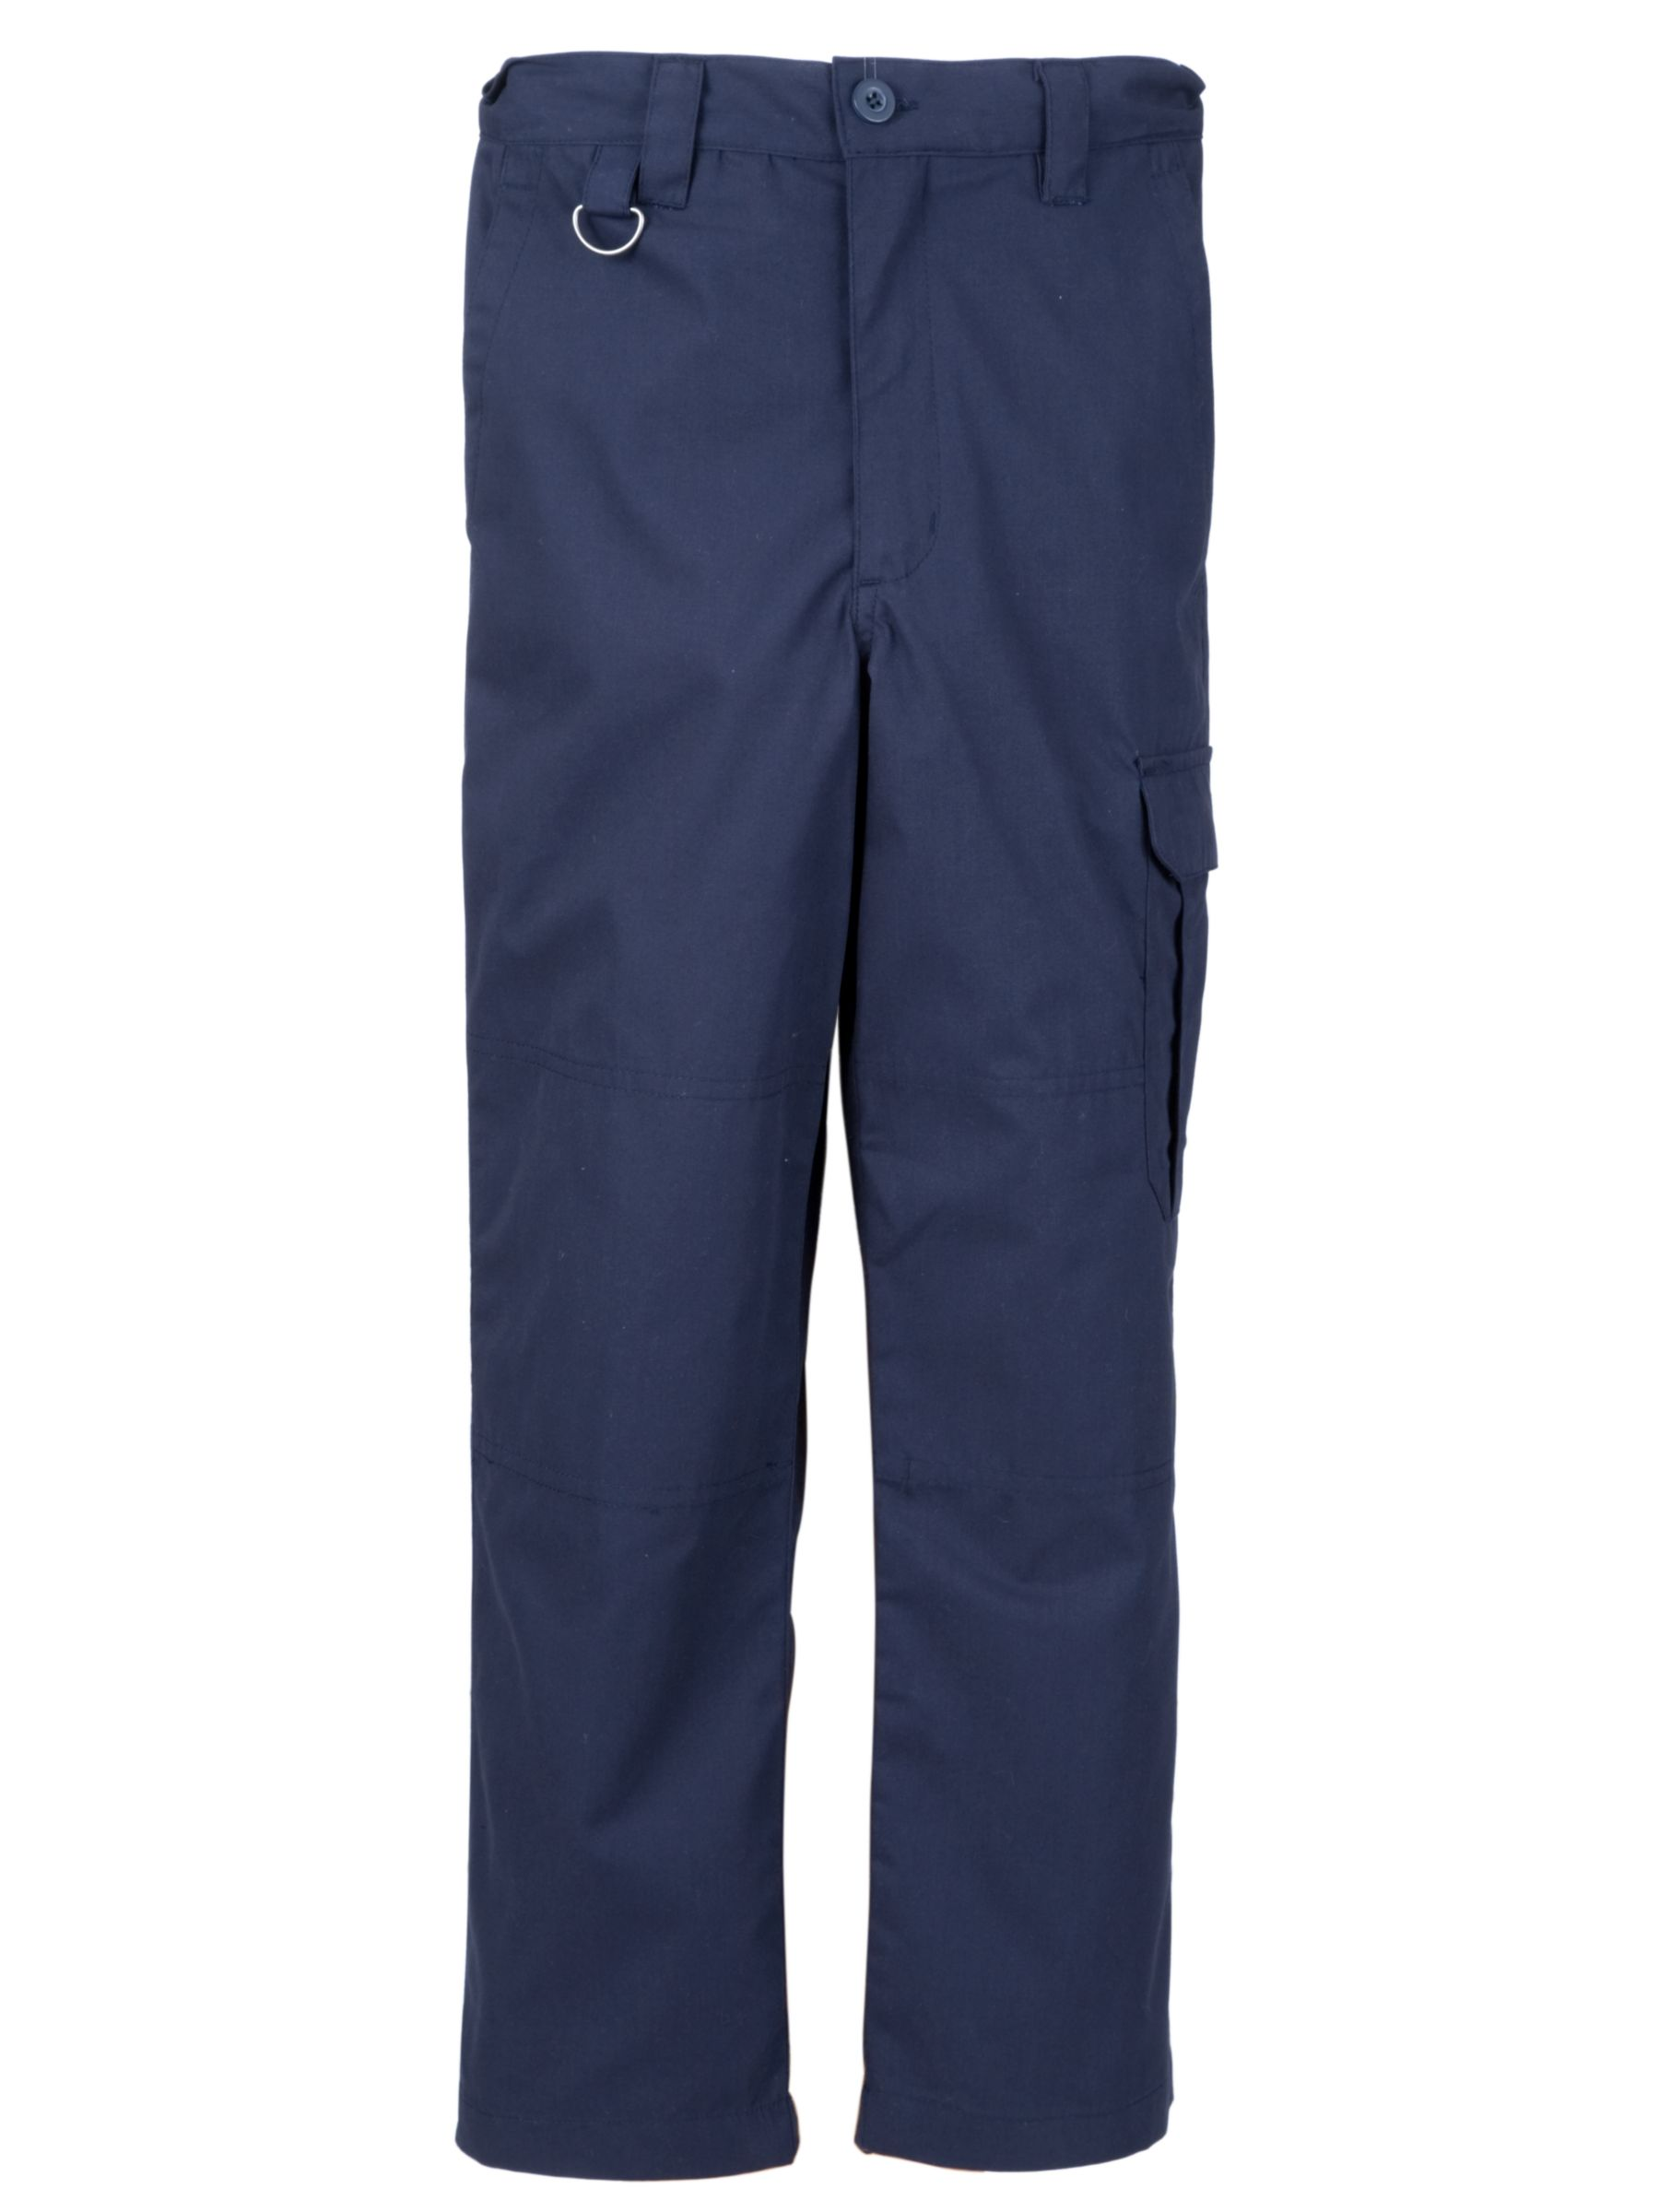 David Luke Activity Trousers, Navy